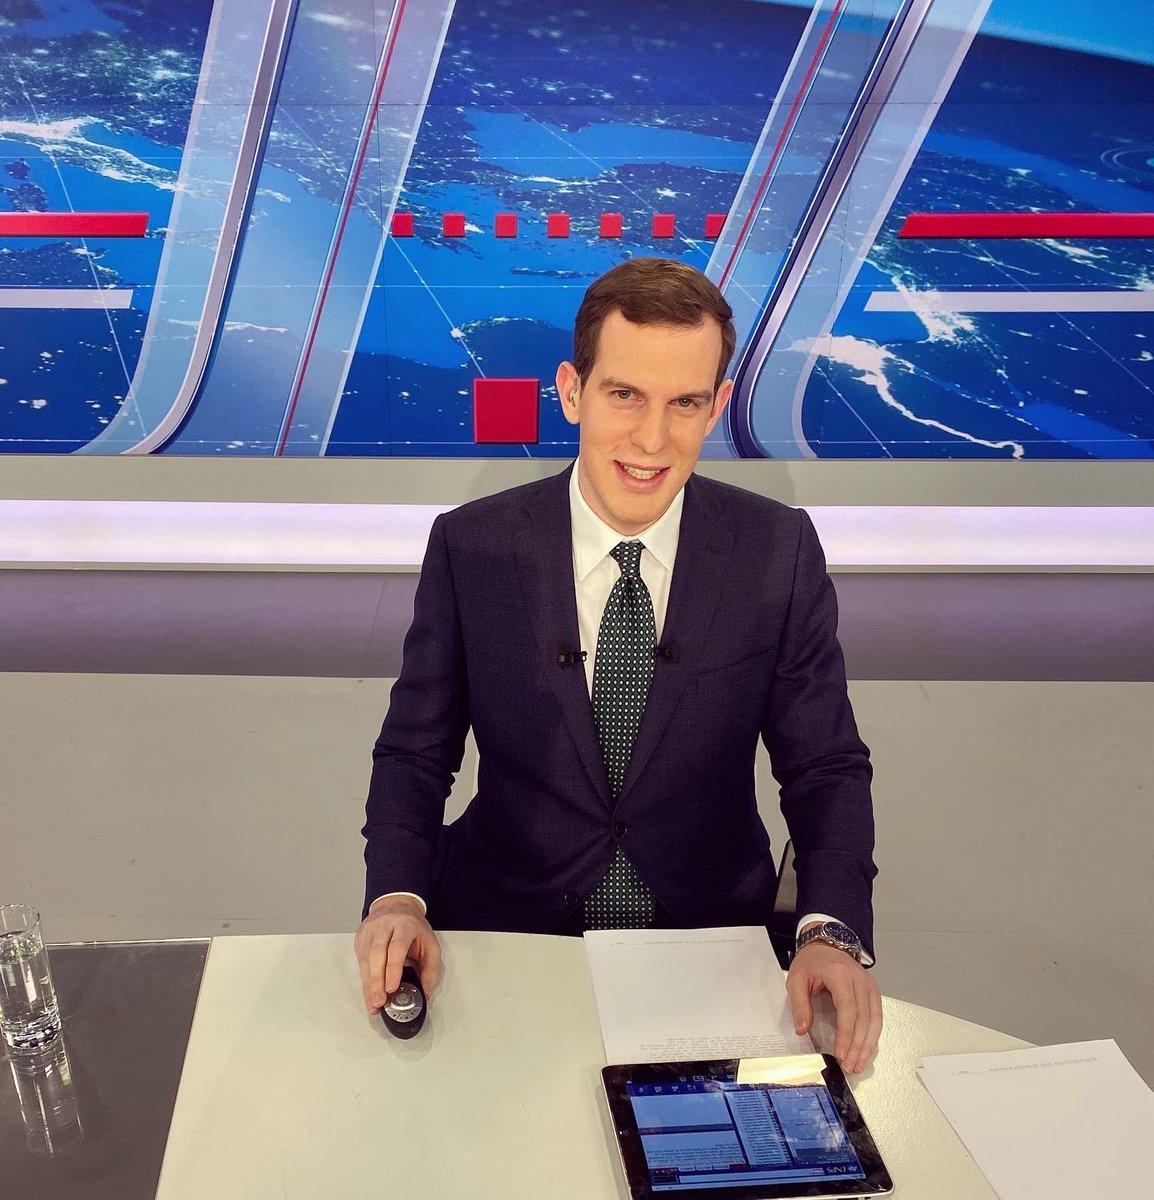 "George Evgenidis on Twitter: ""Το 2019 μου έφερε αίφνης την ένταξη στην  οικογένεια του ΣΚΑΪ. Με θερμές ευχαριστίες για όλους τους ανθρώπους που  δουλεύουμε καθημερινά μαζί σε τηλεόραση και ραδιόφωνο, αλλά και"